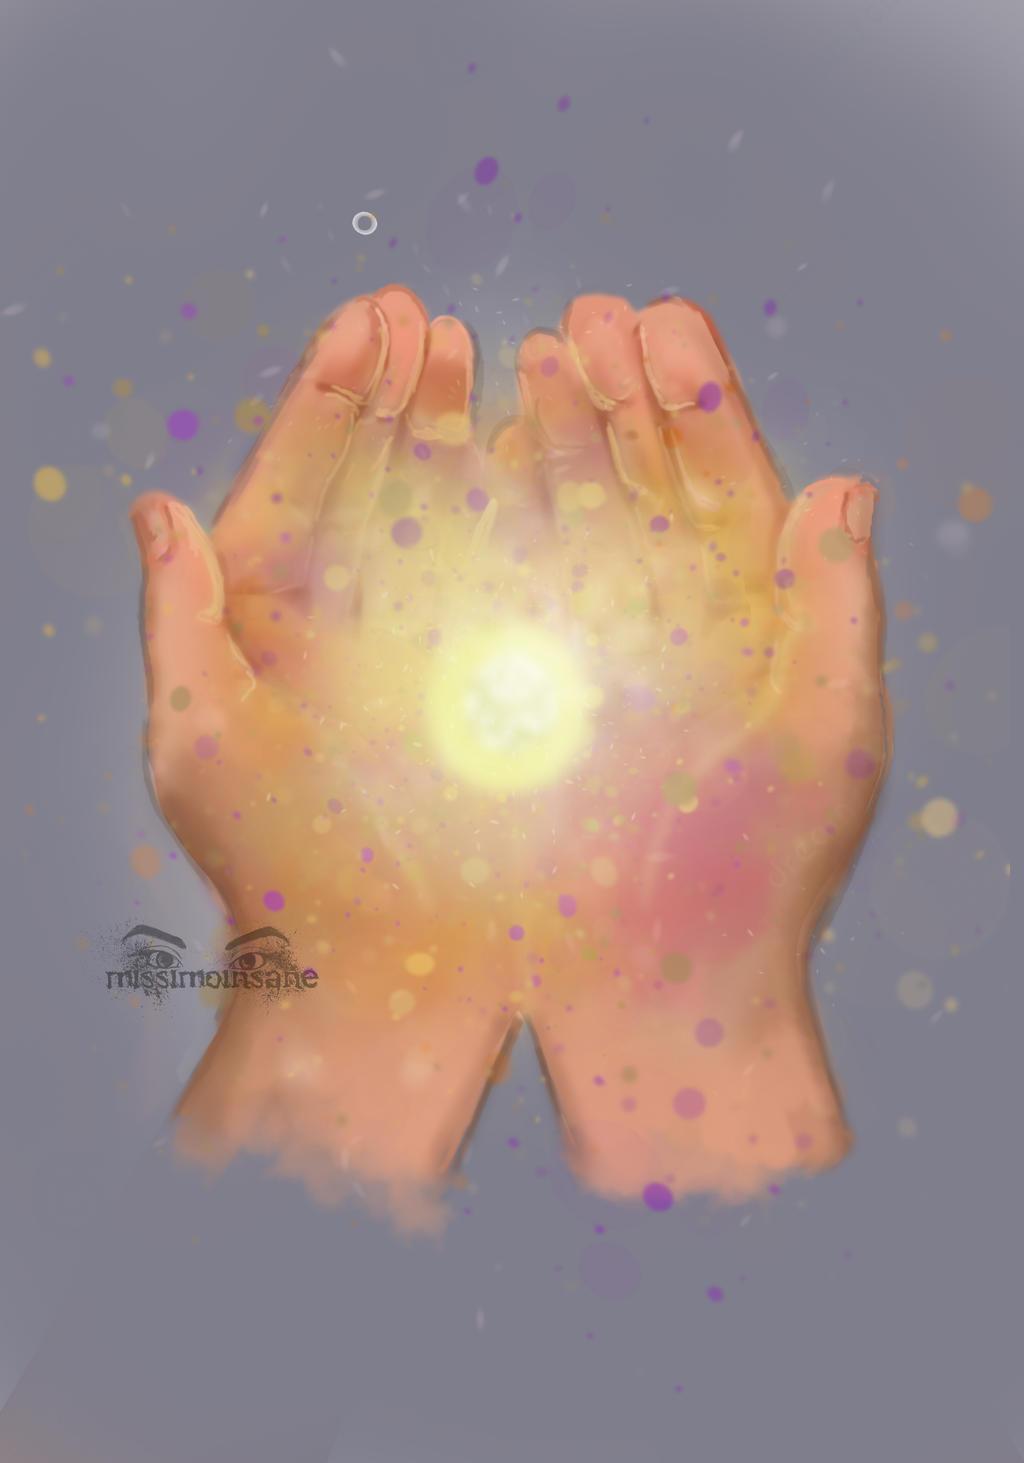 DAILY SPITPAINT No.2 - Stardust